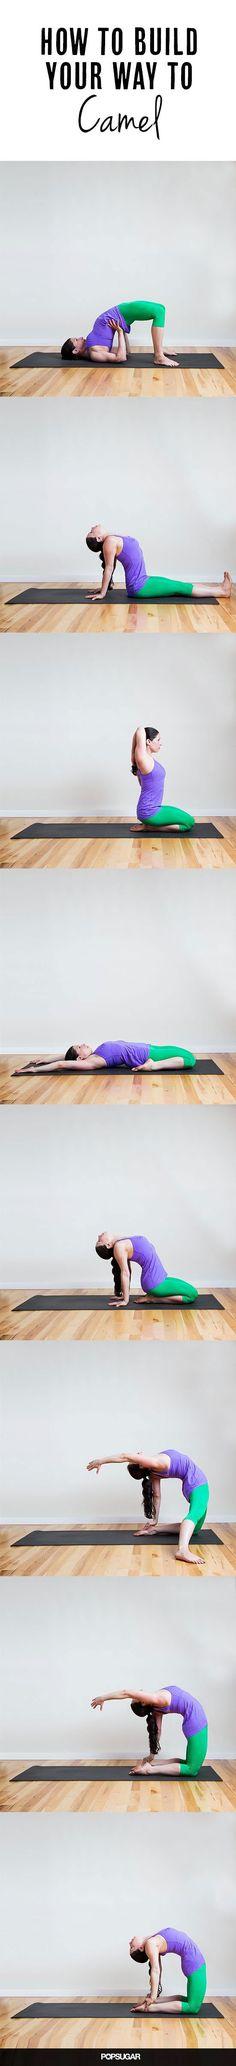 Camel Yoga Pose (Ustrasana)